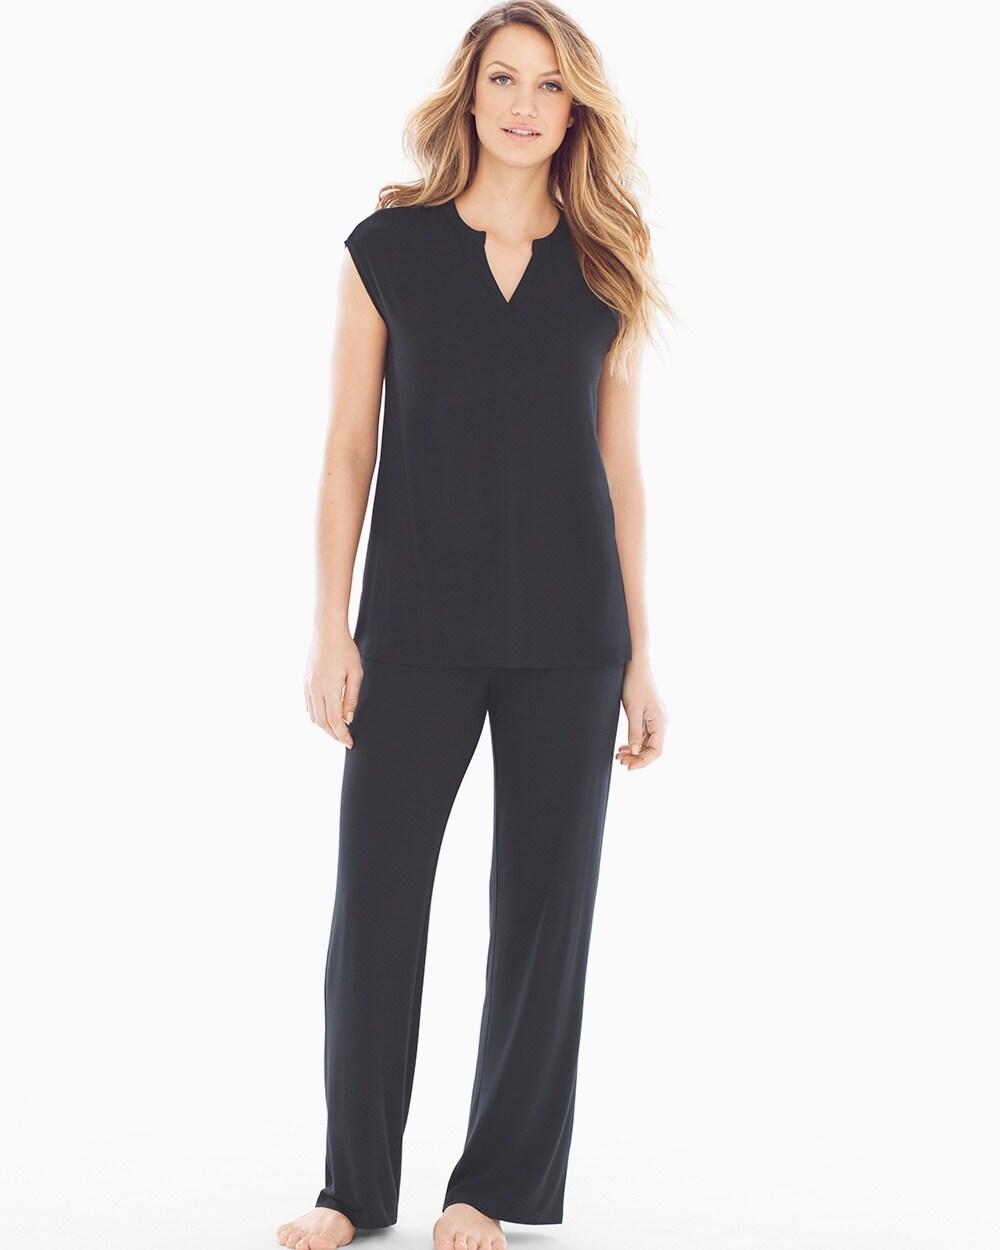 1e9785d685 Return to thumbnail image selection Cap Sleeve V-Neck Popover Pajama Top  Black